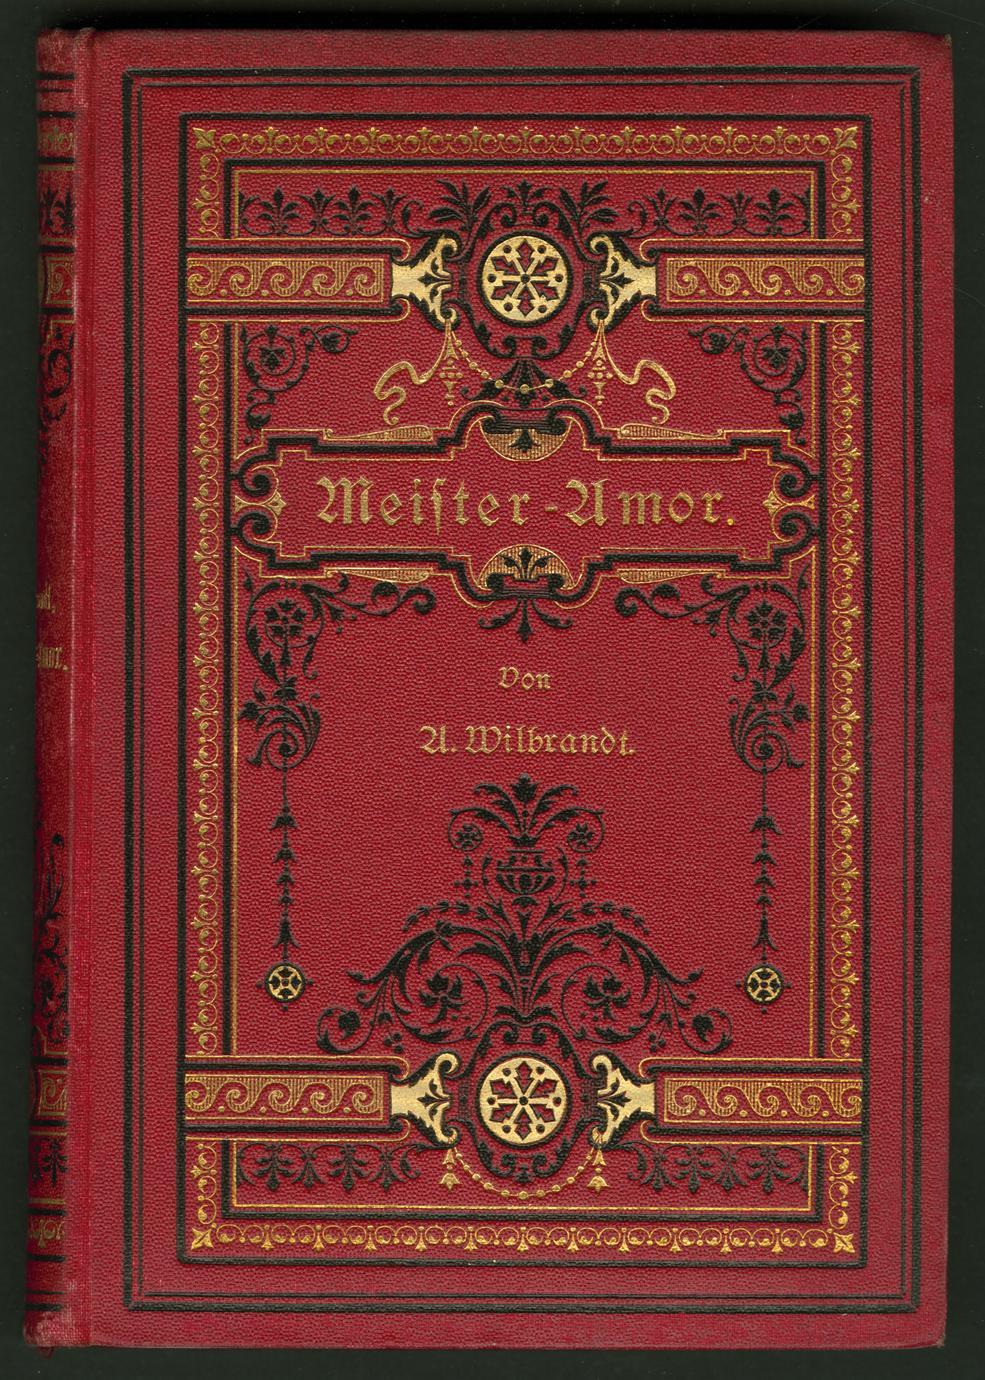 Meister Amor (1 of 3)